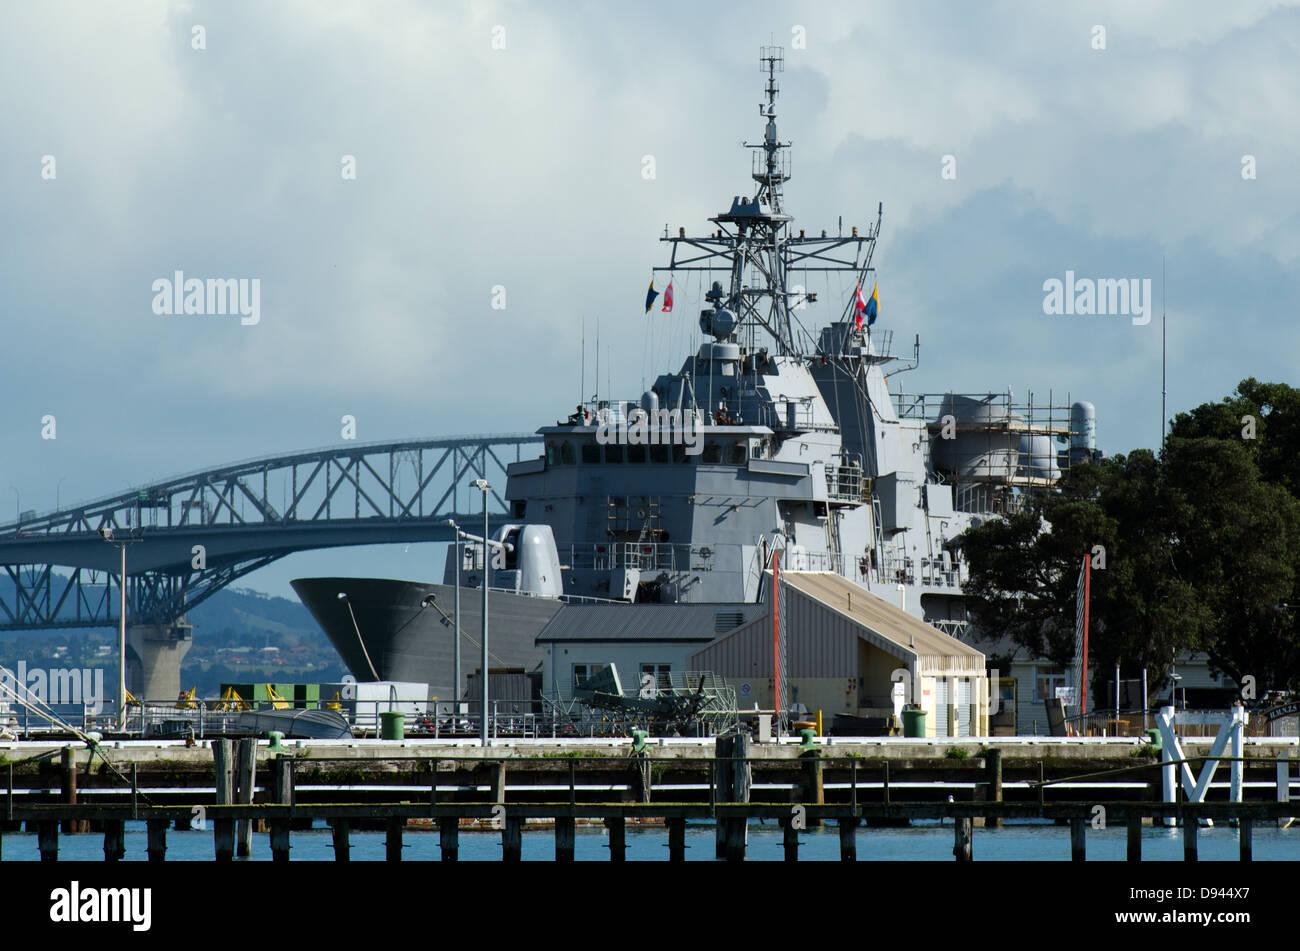 HMNZS Te Mana F111 in Devonport Naval Base, New Zealand - Stock Image